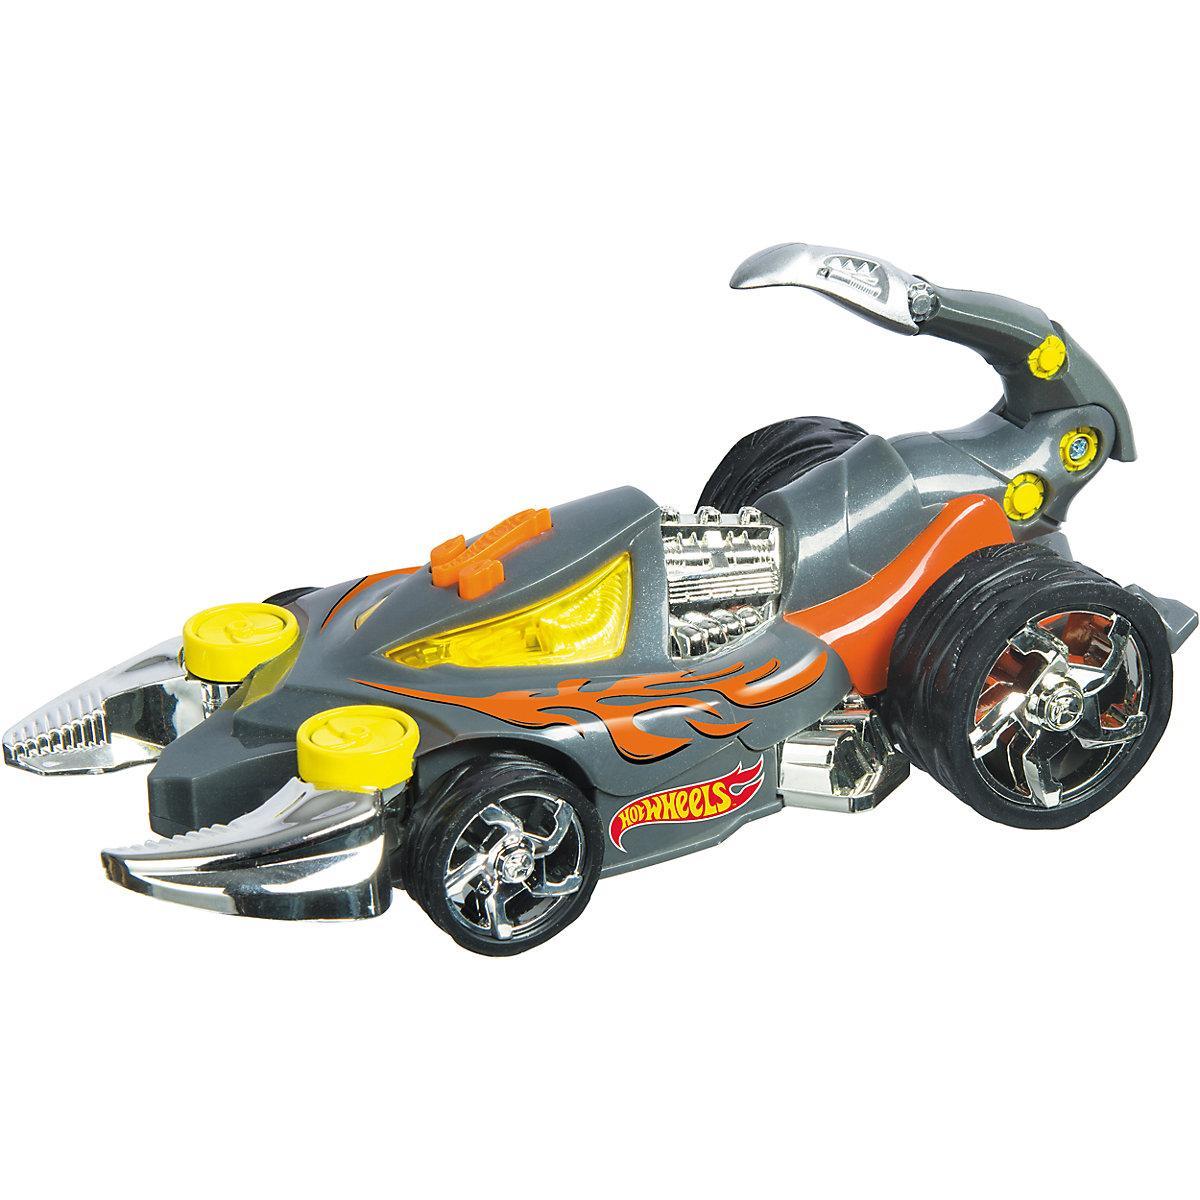 Машина Хот Вилс Hot Wheels скорпион горячие колеса свет и звук 23 см Monster Action - Scorpedo 90512